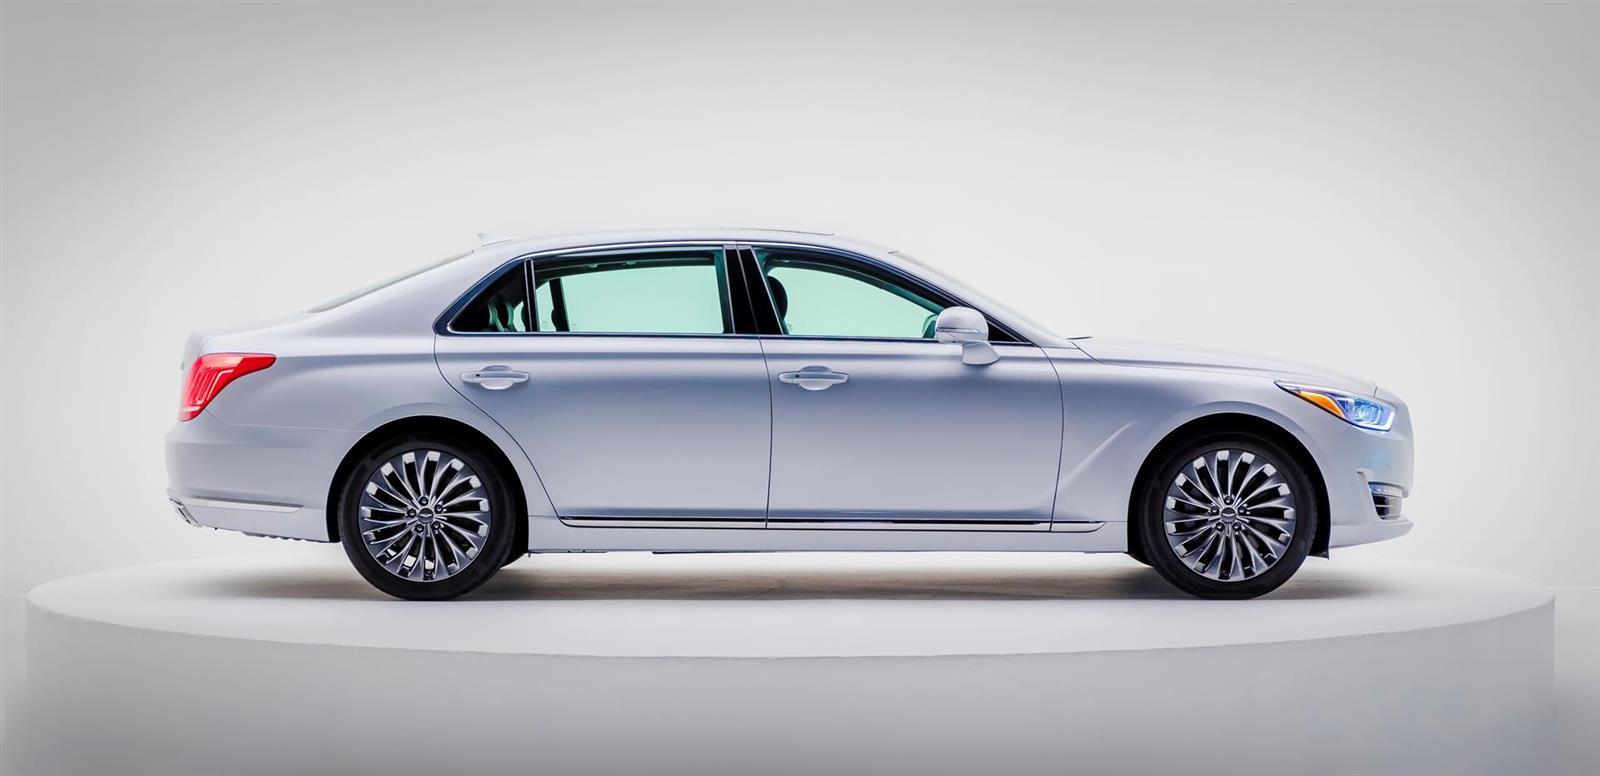 Genesis Car Price India